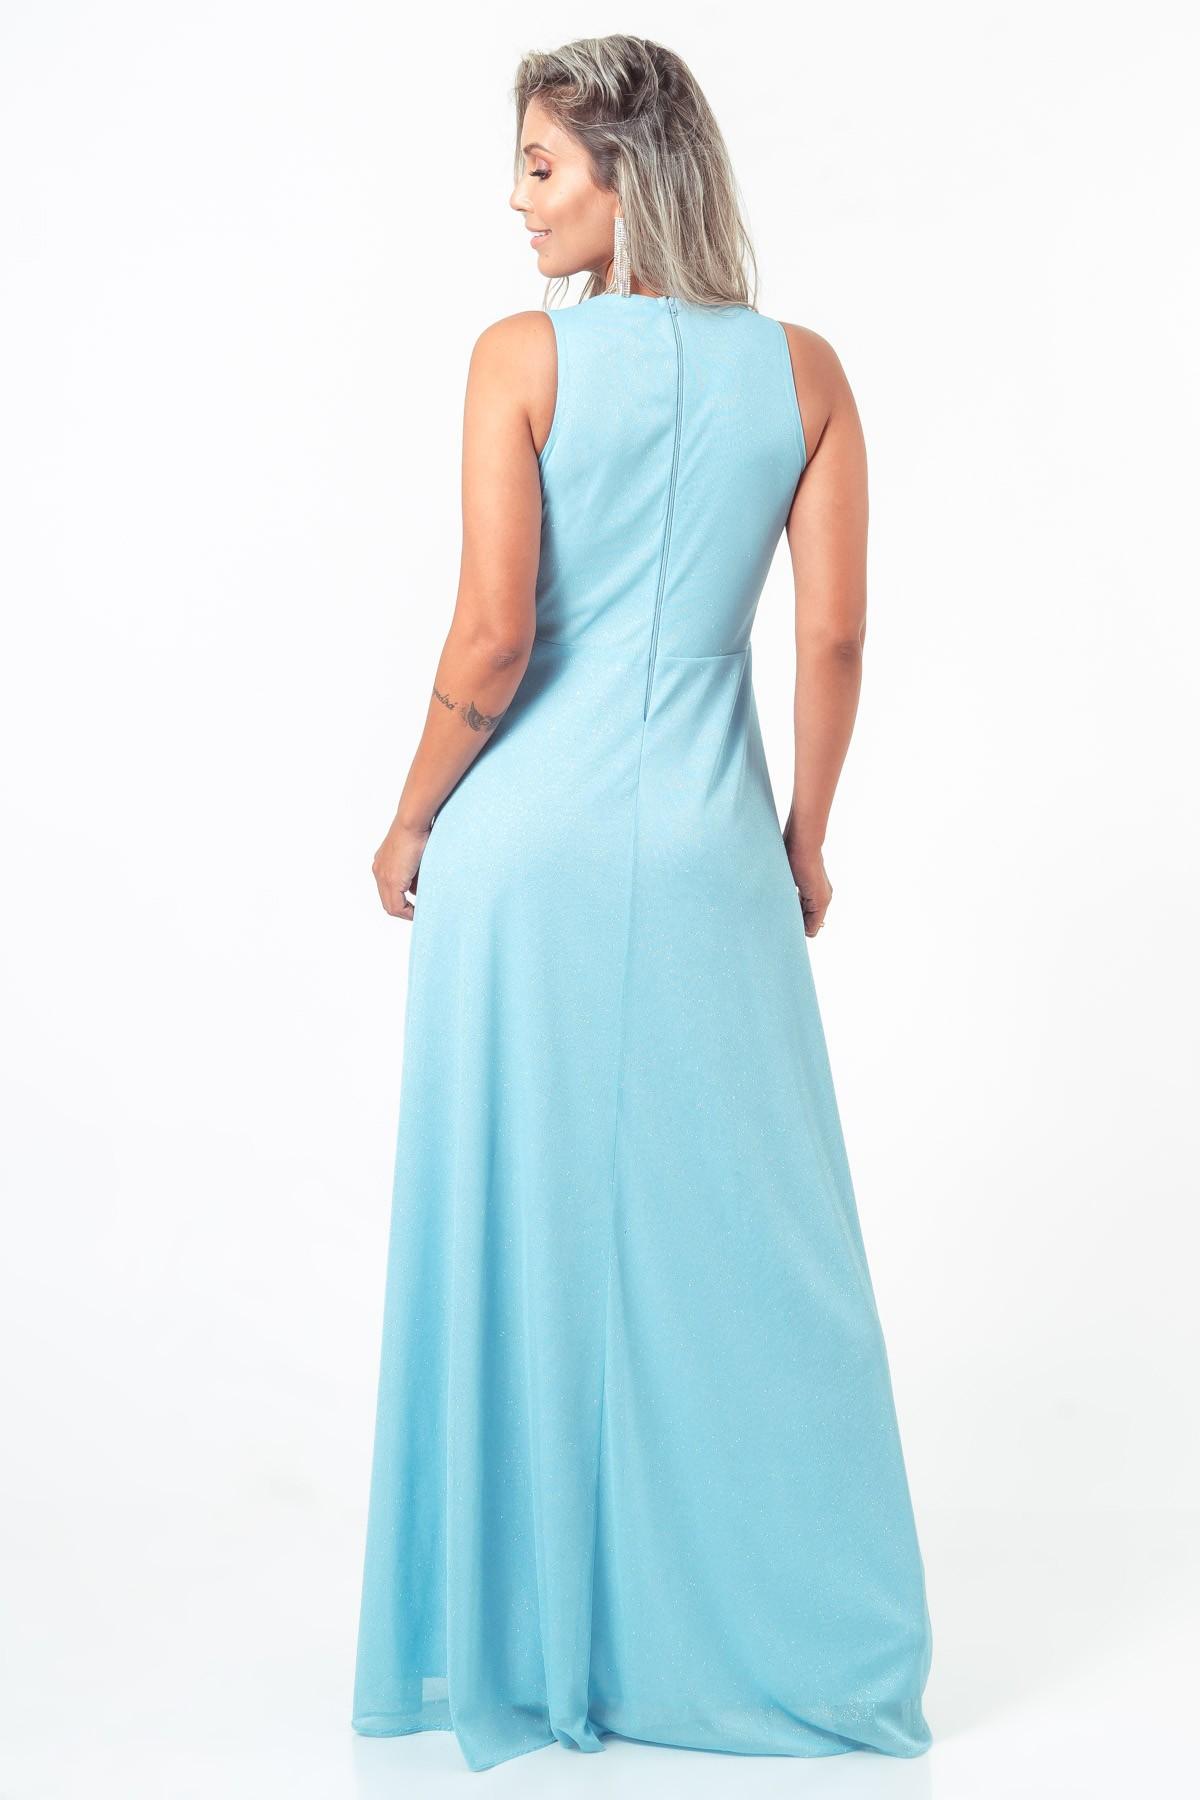 Vestido Liz - SERENITY